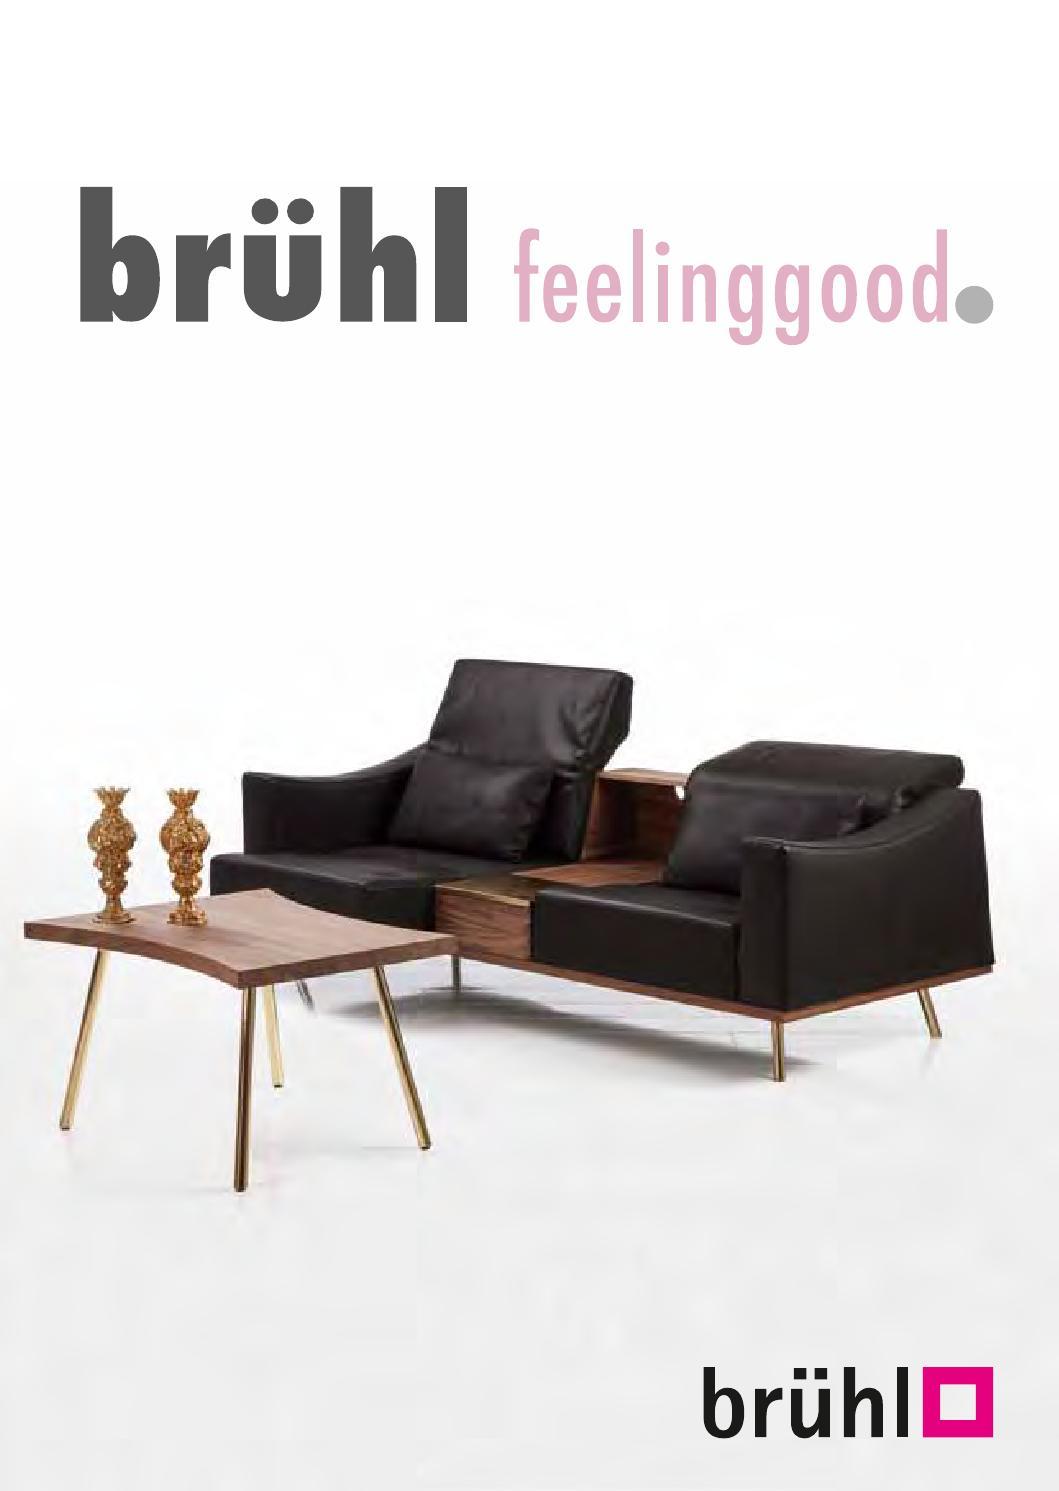 bruehl feeling good katalog 2014 by perspektive werbeagentur issuu. Black Bedroom Furniture Sets. Home Design Ideas